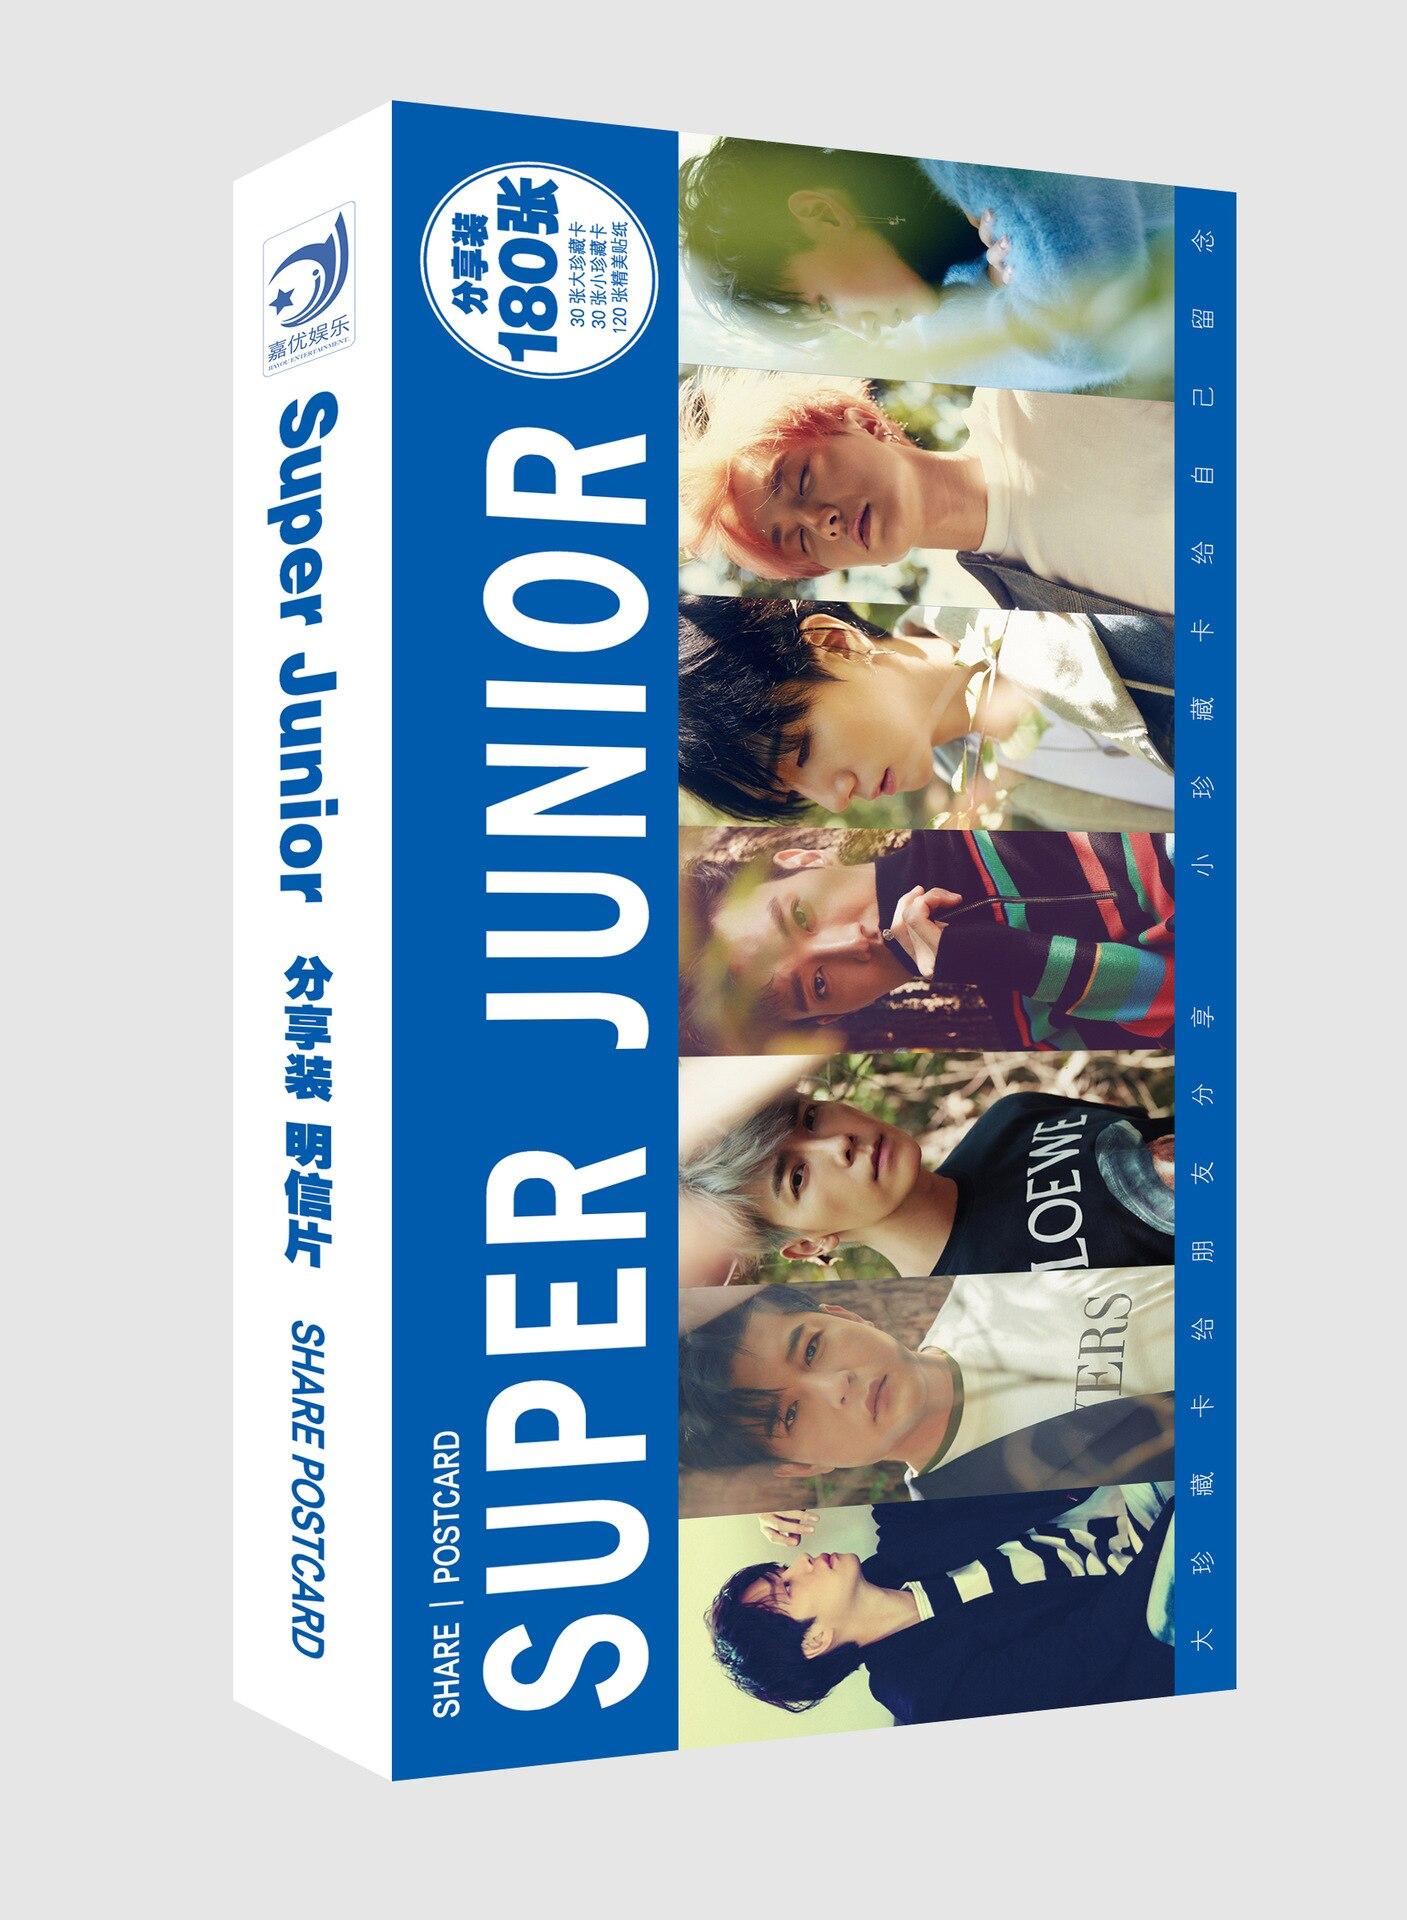 Kpop Super Junior SJ Leeteuk Heechul Yesung Fanart Postcard Post Cards Sticker Artbook Gift Cosplay Props Book Set Collection